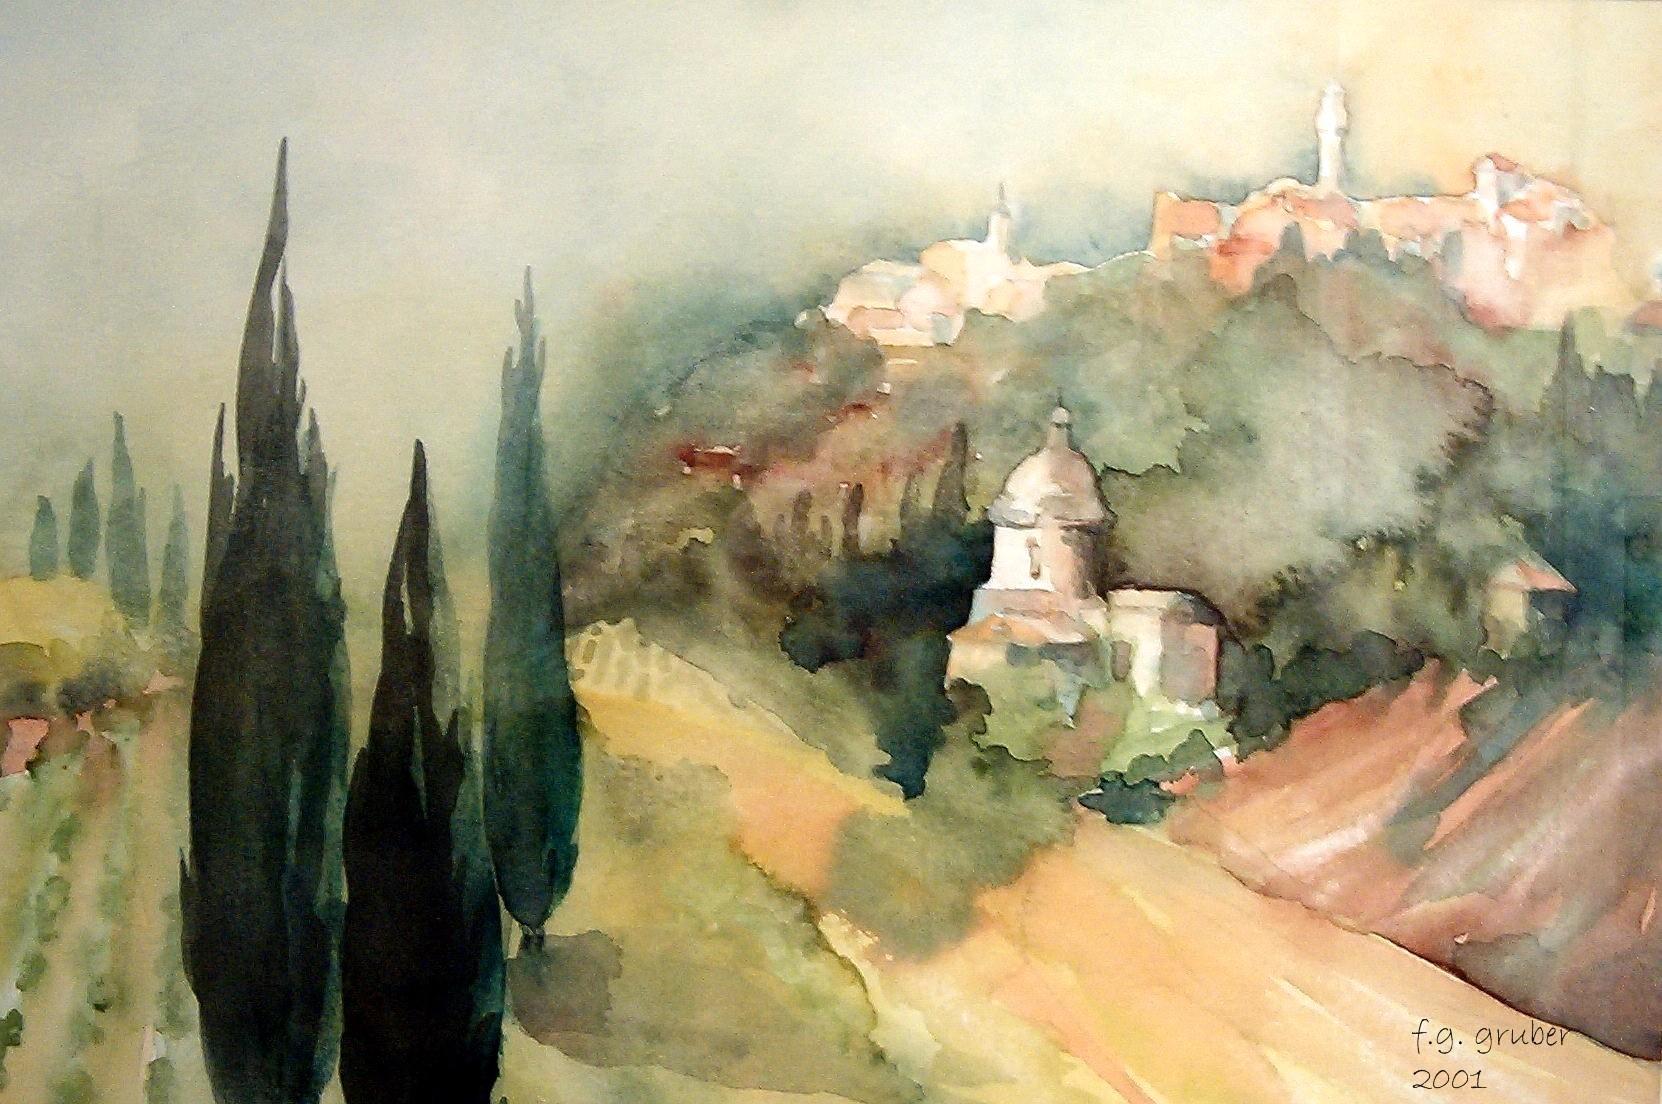 aquarell - blick auf montepulciano toskana - italien